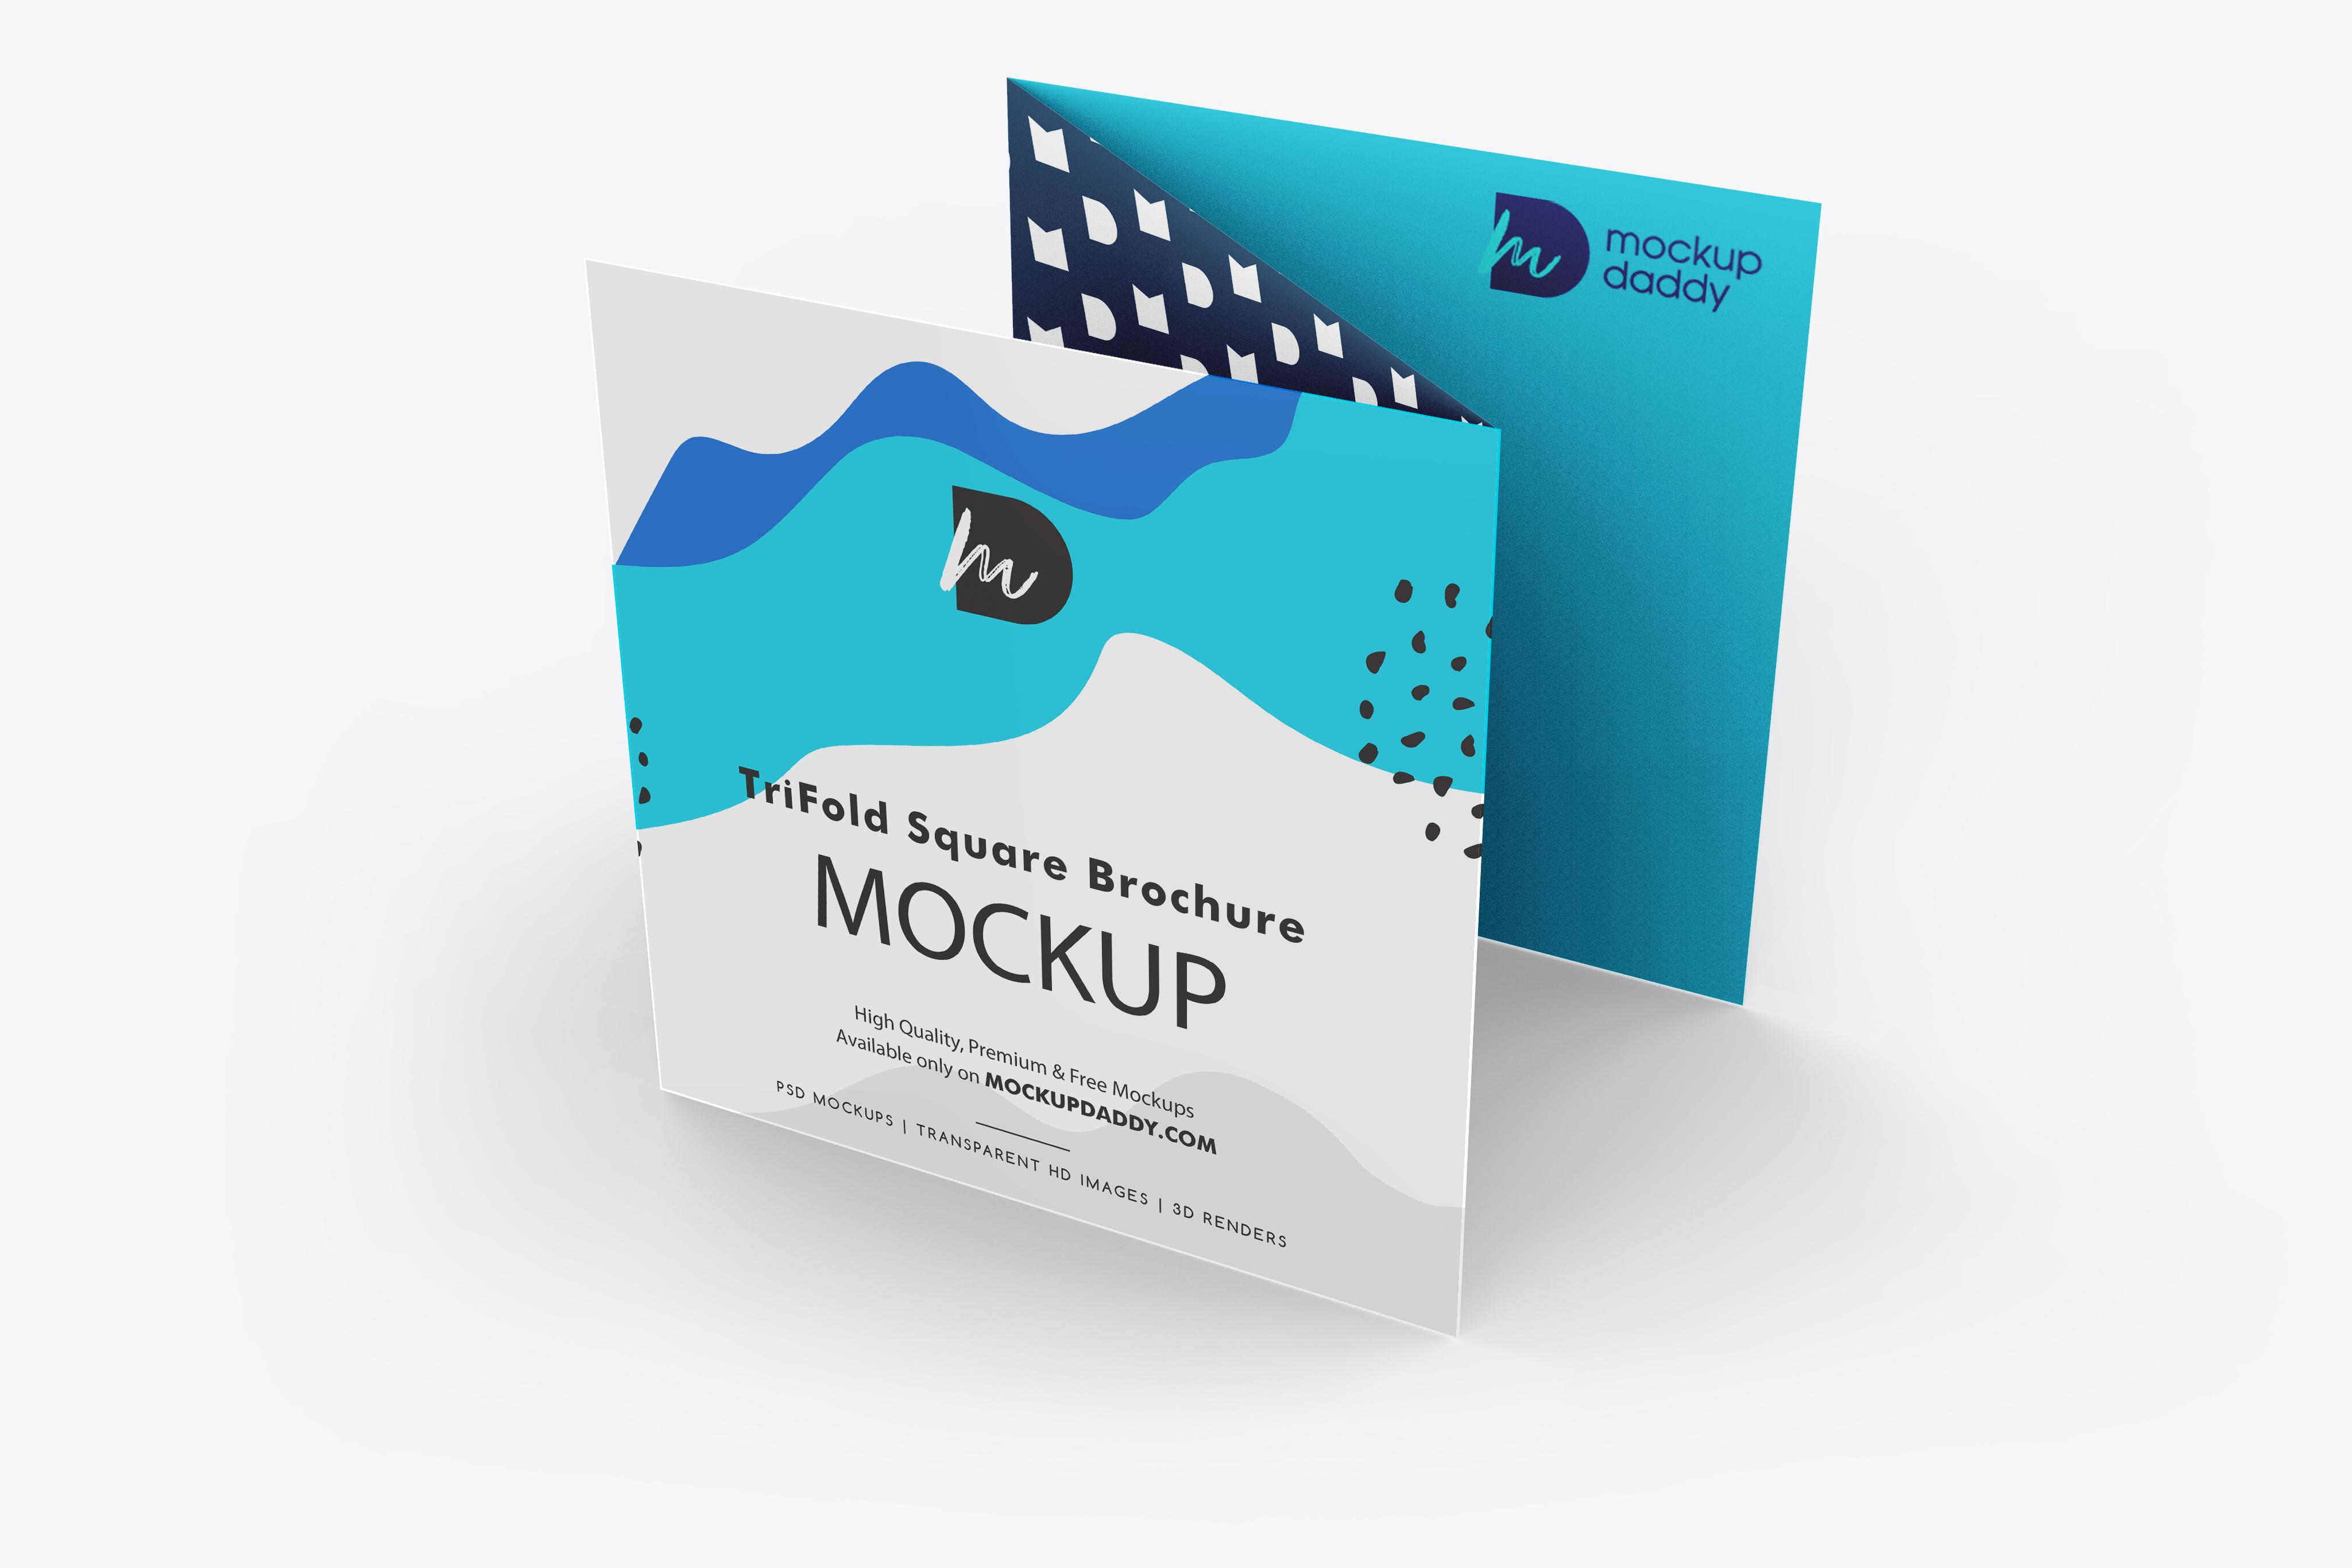 Trifold Square Brochure Mockup Free Mockup Daddy